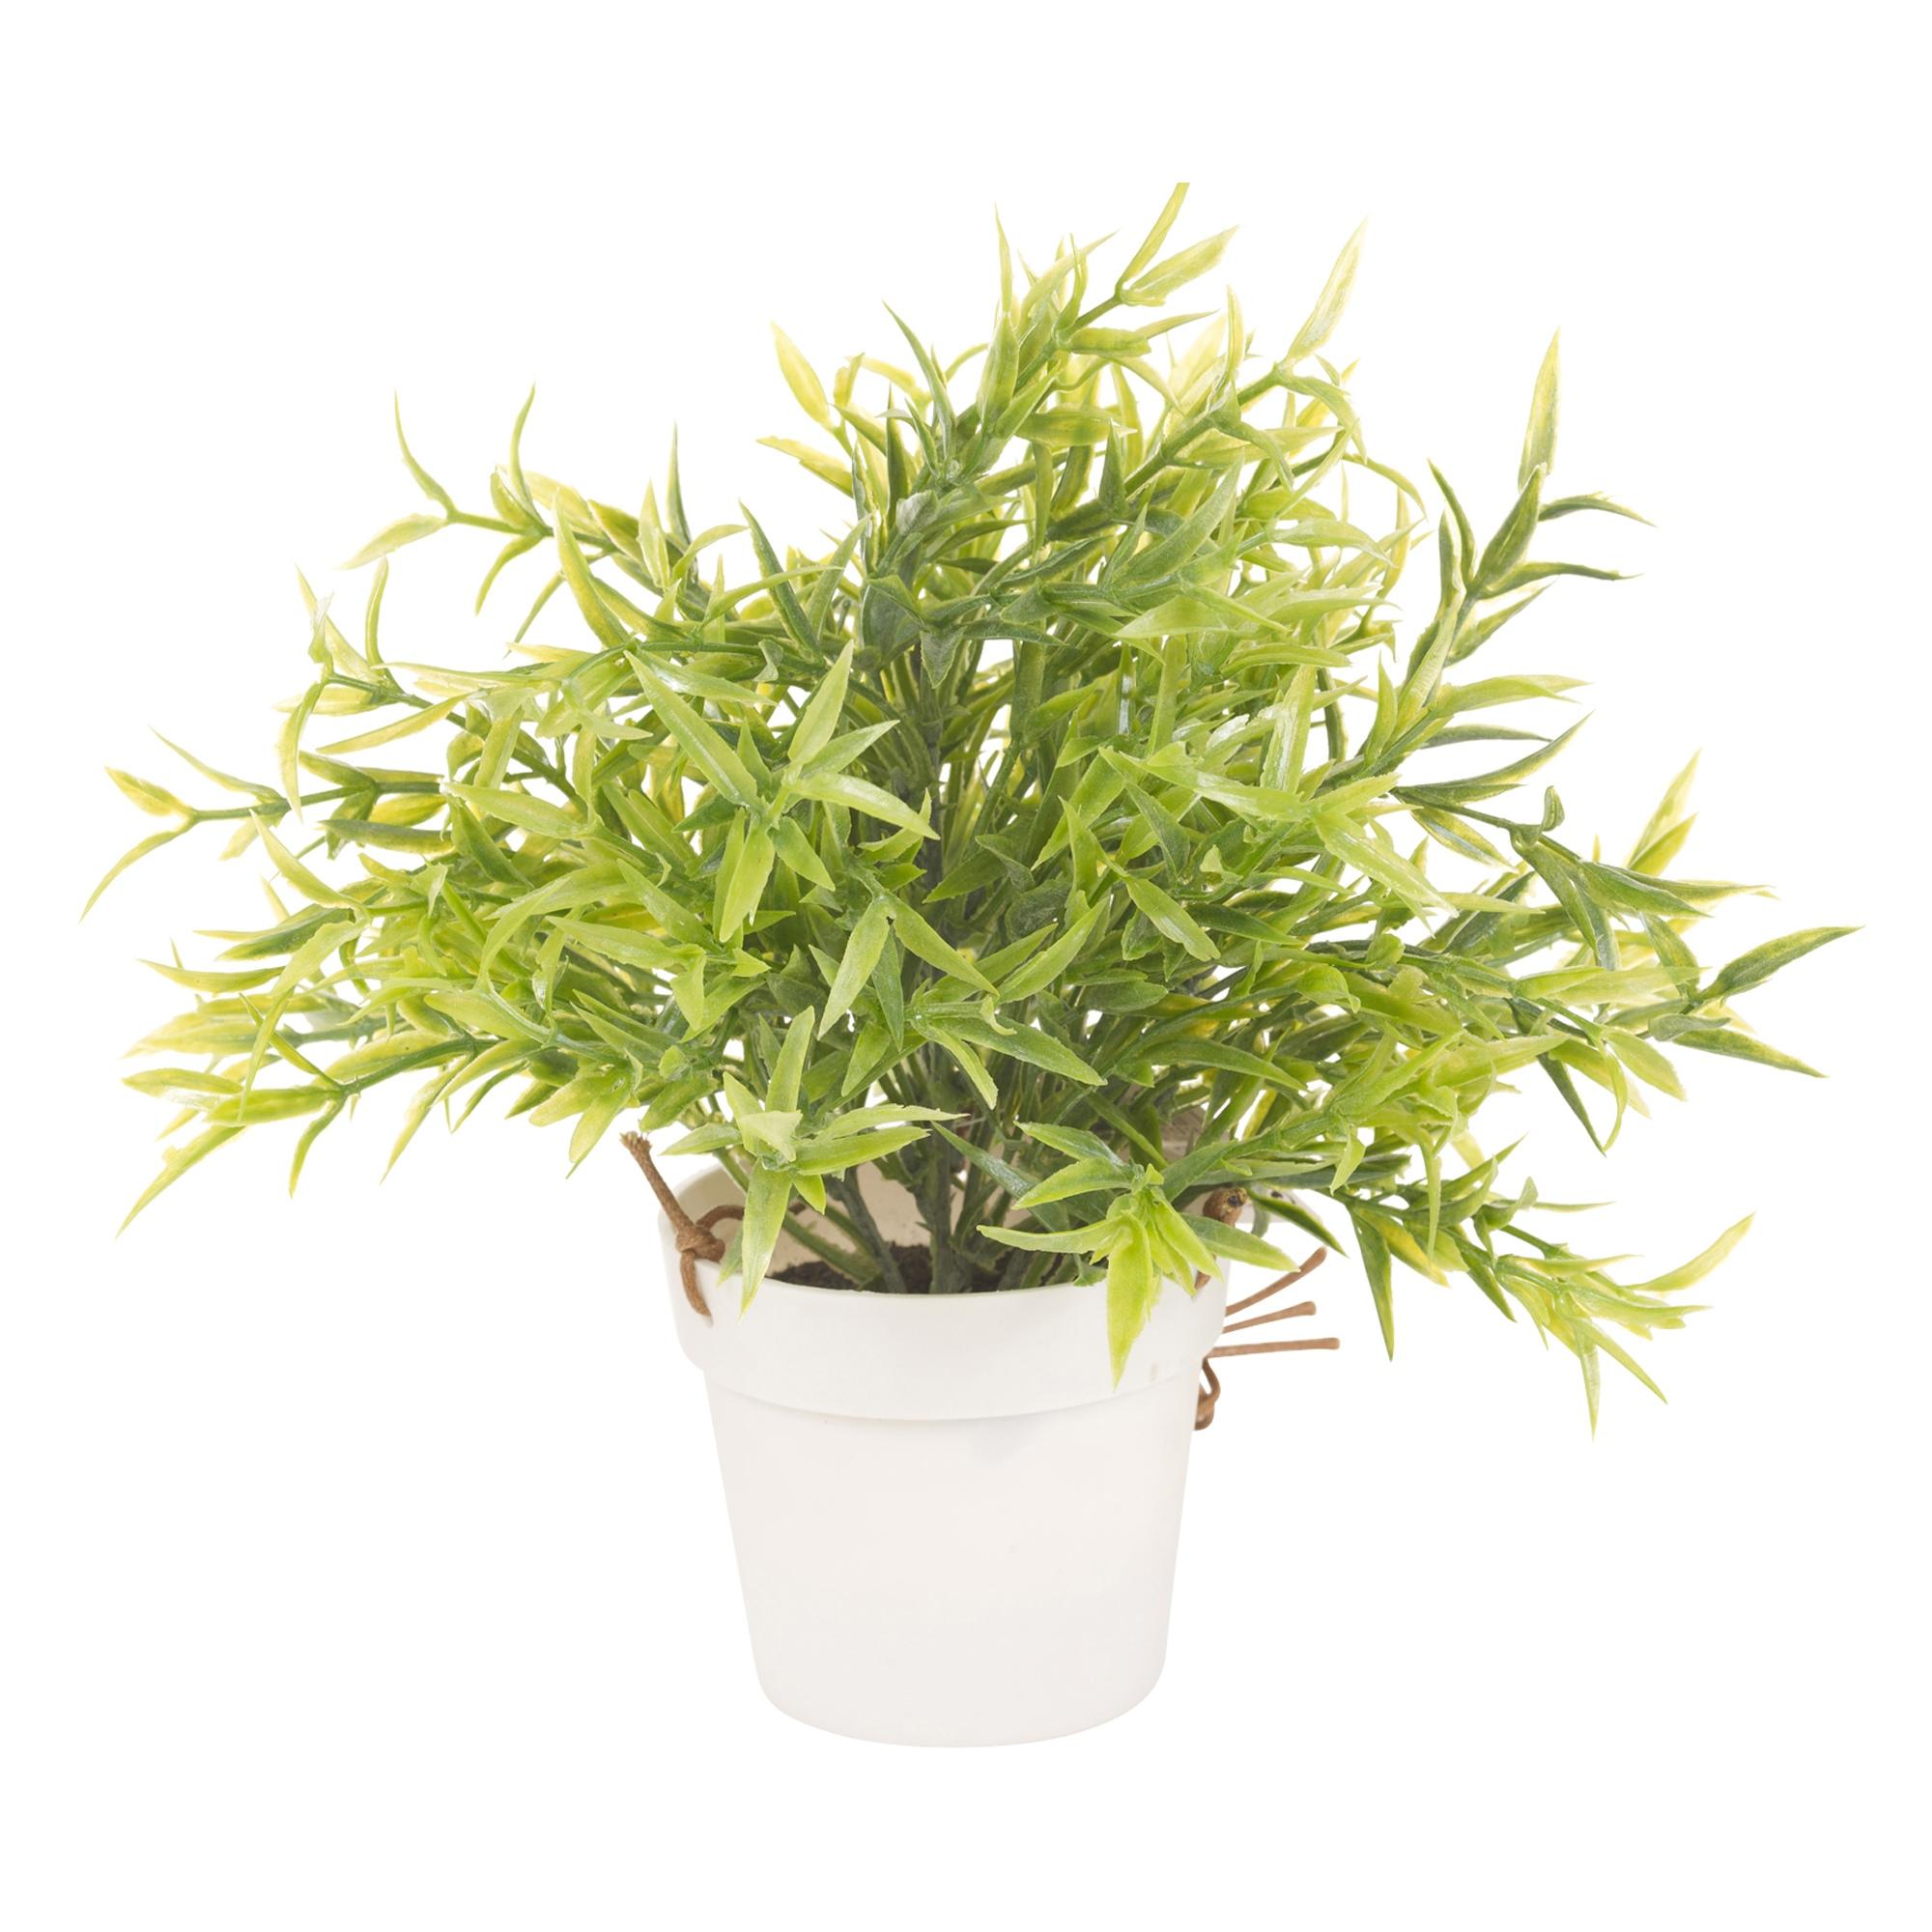 artificial hanging plant pot basket indoor outdoor garden decor realistic leafs ebay. Black Bedroom Furniture Sets. Home Design Ideas